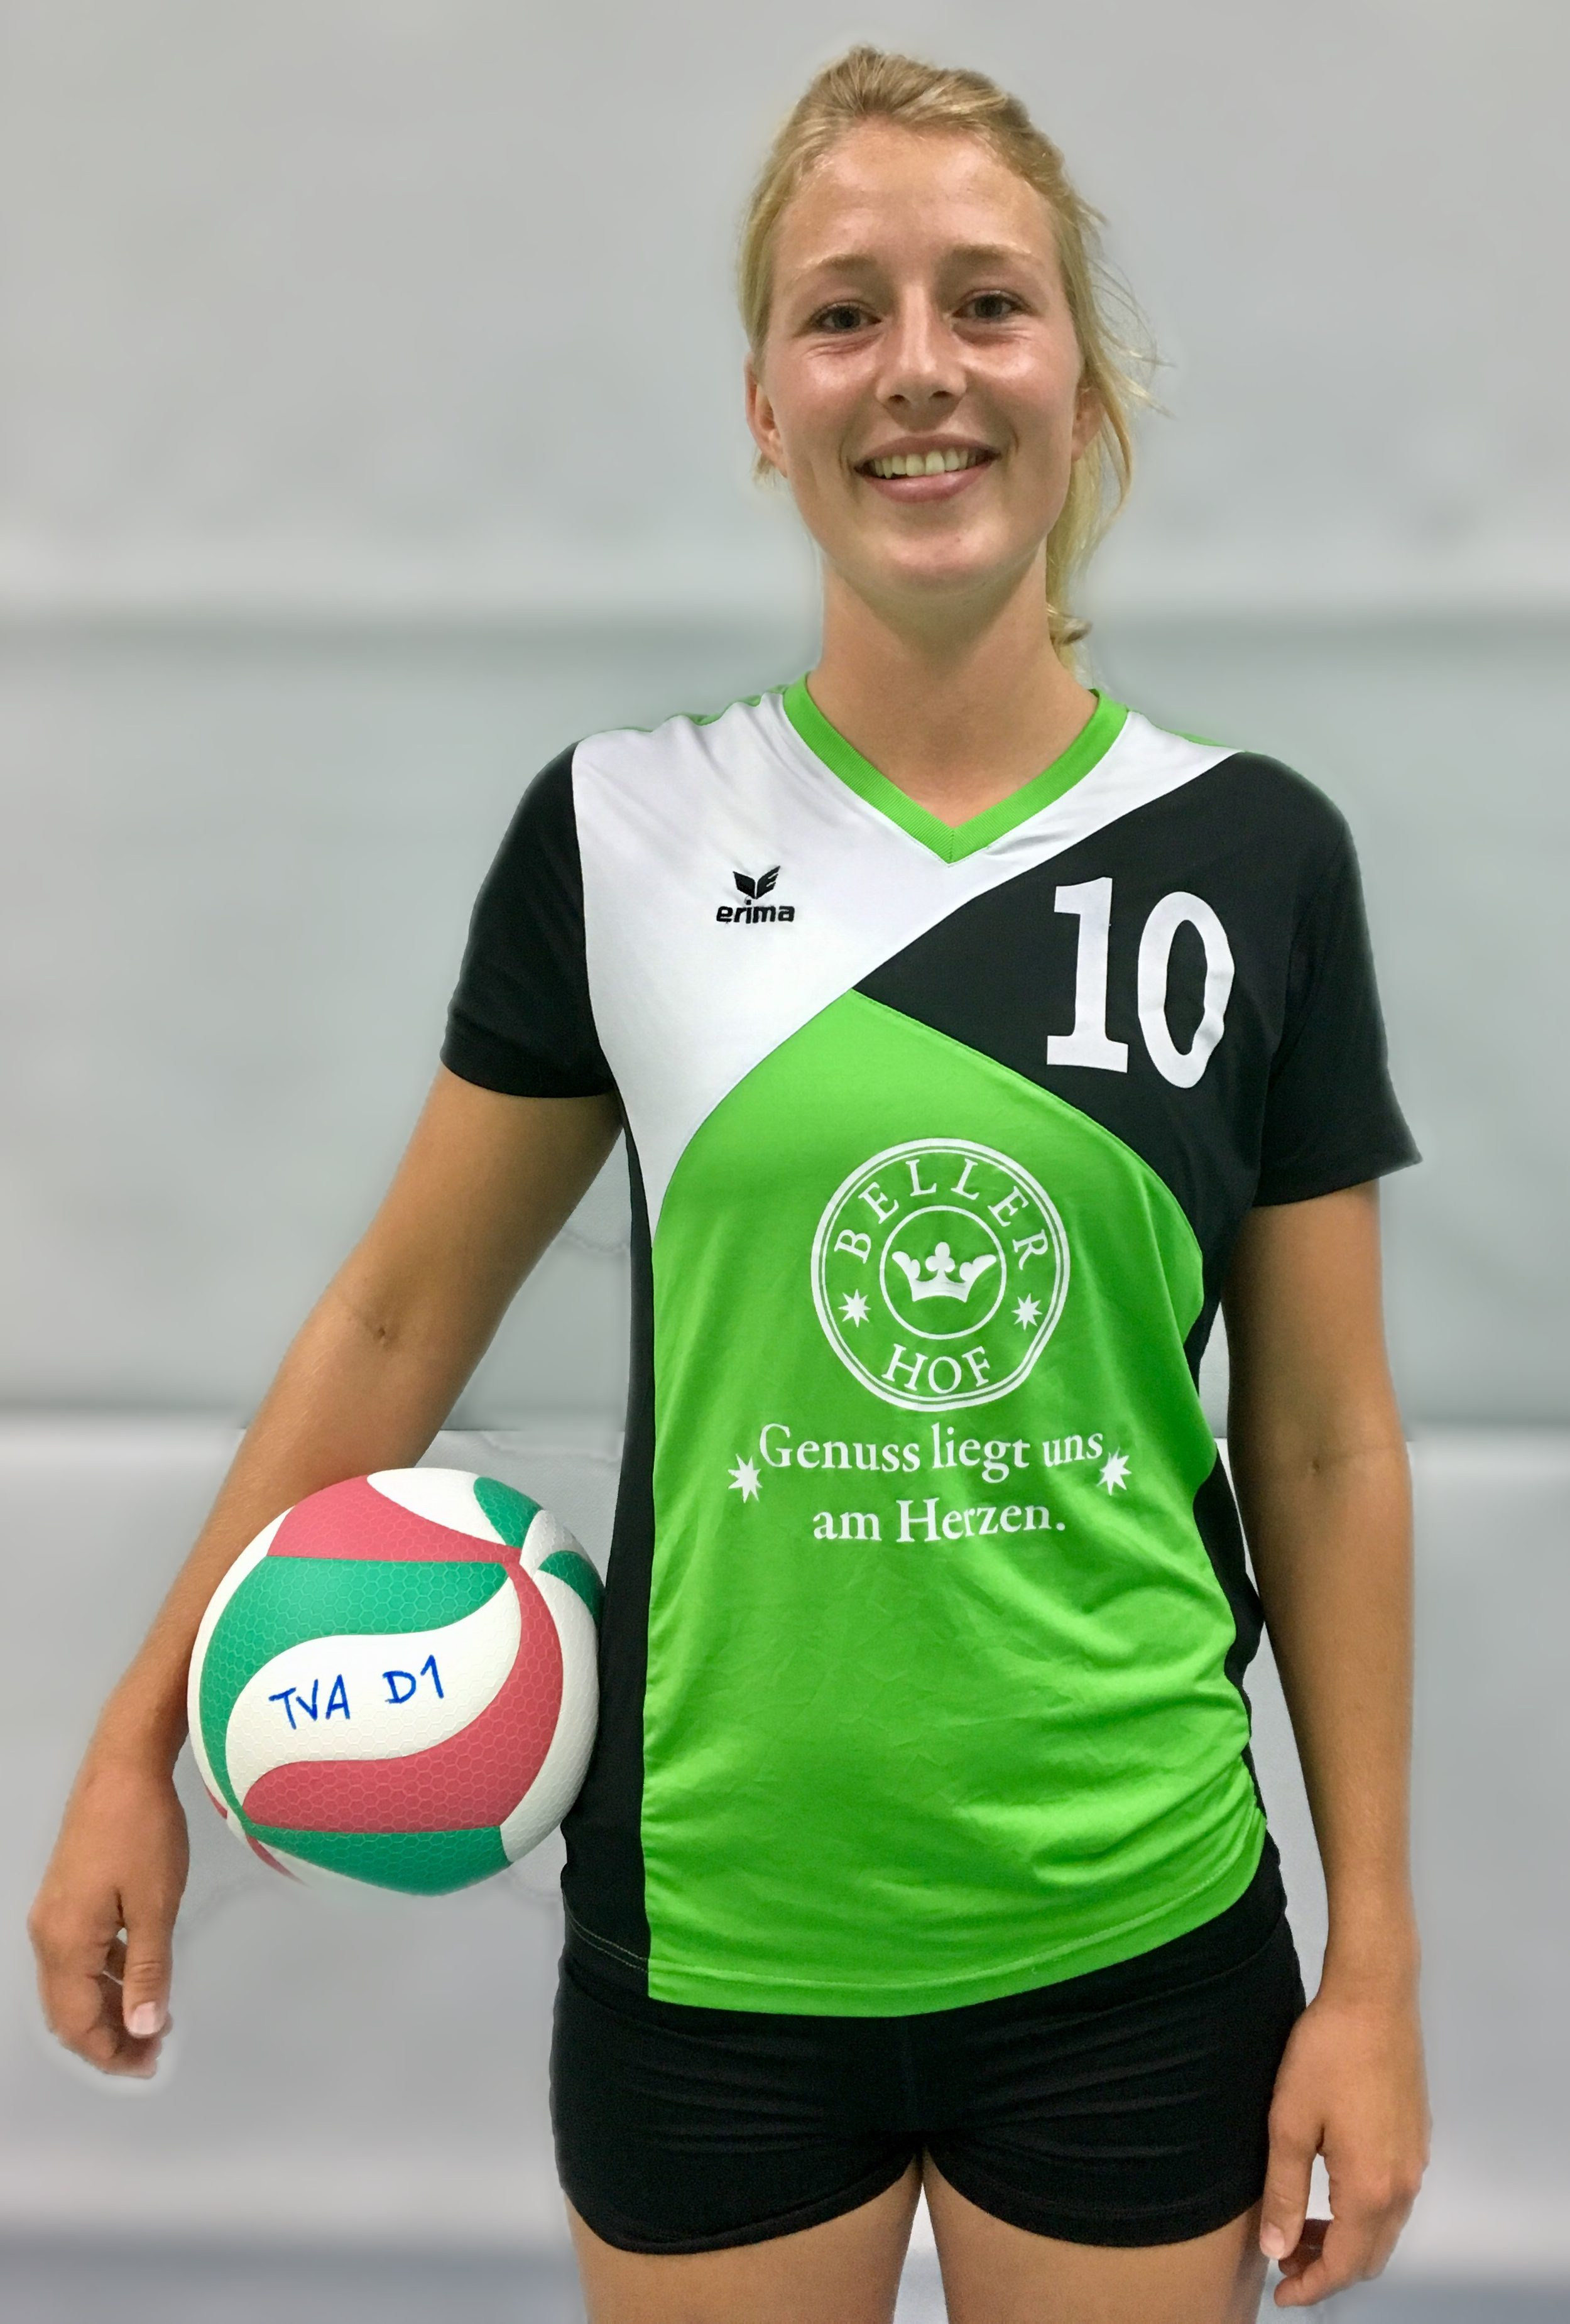 Maja Dirks